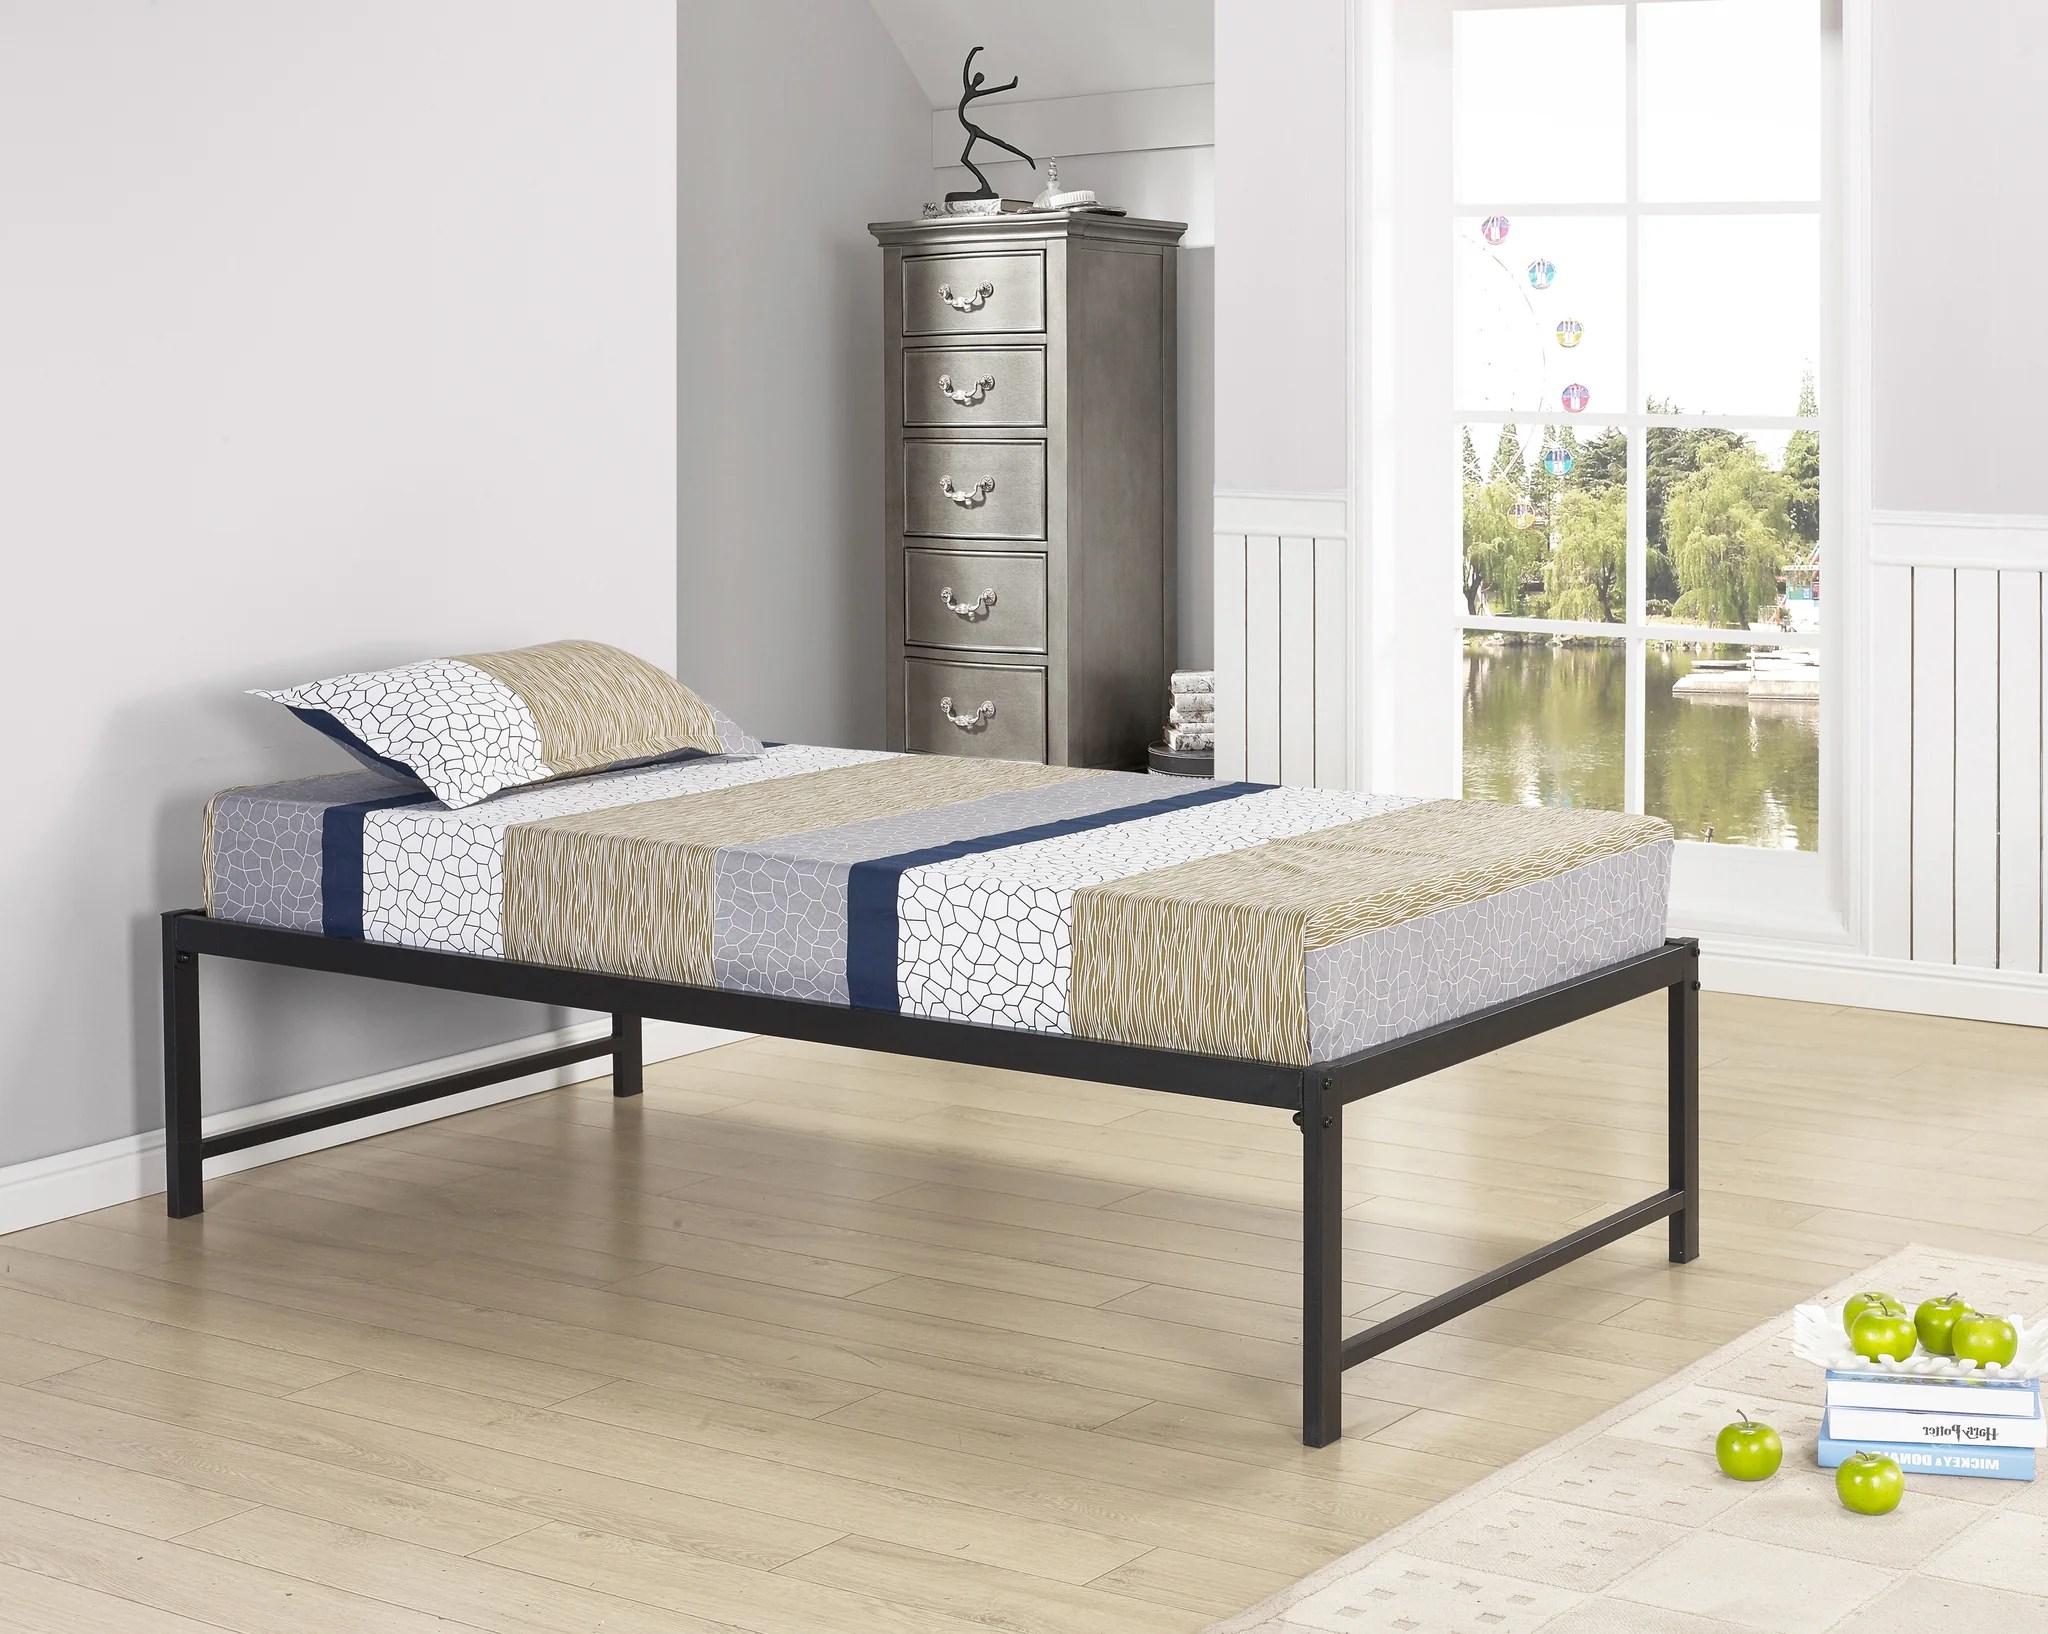 Archer 17 H Platform Daybed Bed Frame With Roll Out Trundle Set Black Metal Twin Headboard Footboard Rails 13 Slats Pilaster Designs